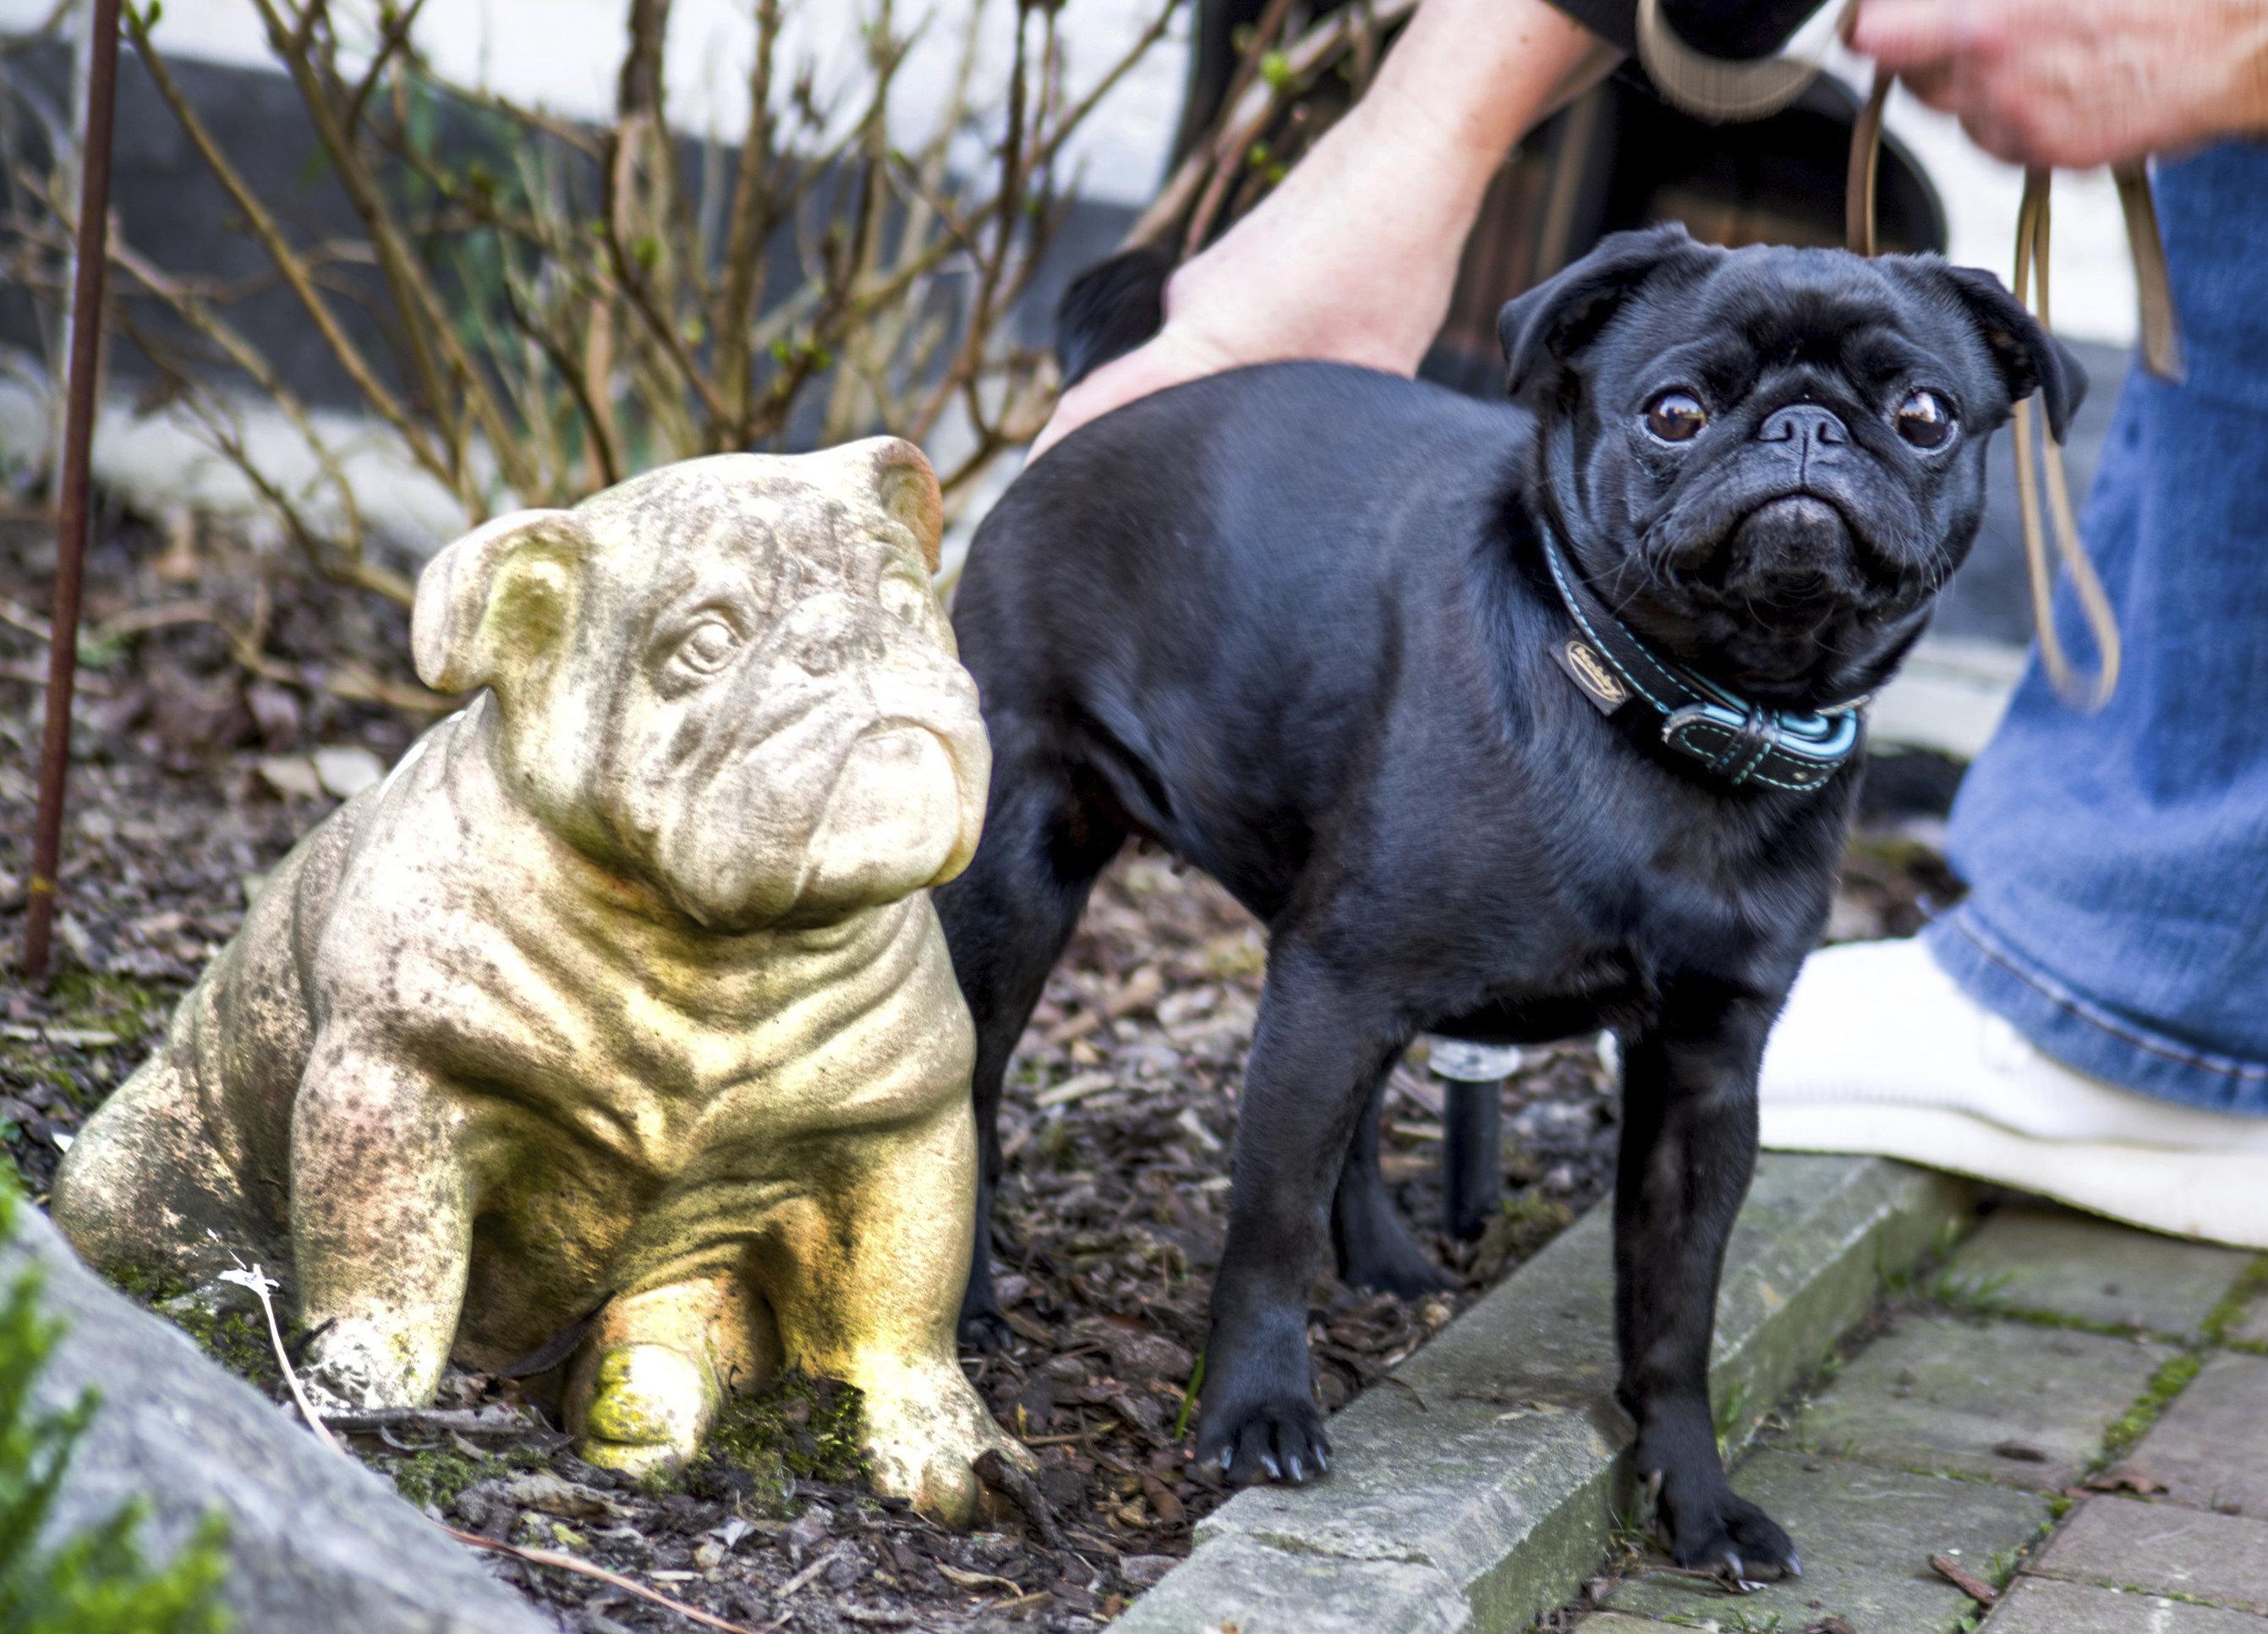 Edda the pug.